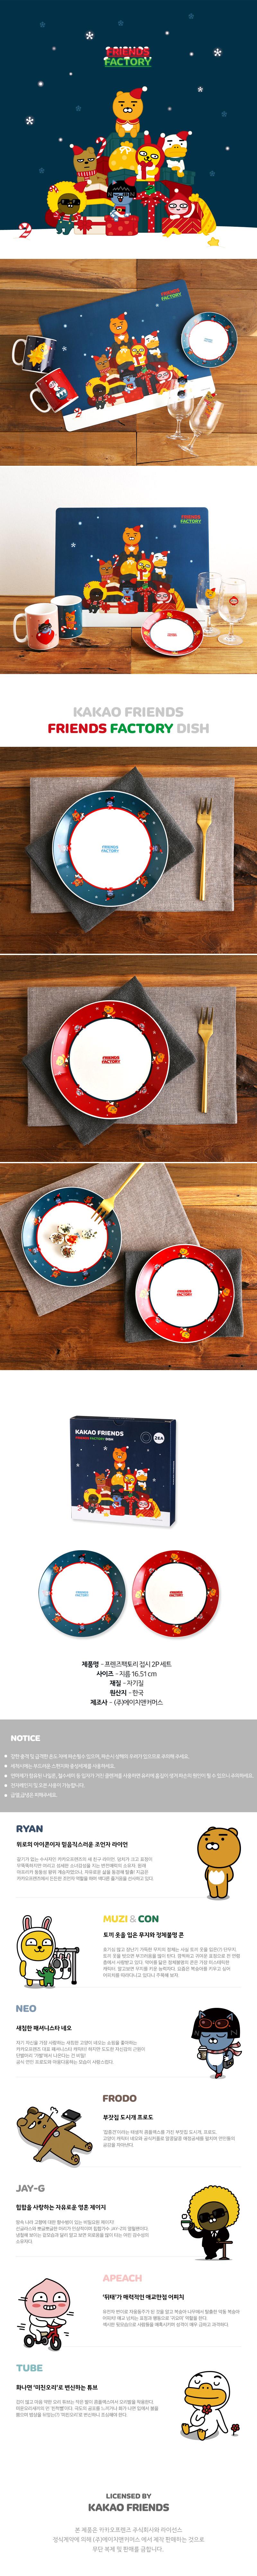 X-mas한정판 카카오프렌즈팩토리 접시 2P세트17,800원-카카오프렌즈생활/패브릭, 식기/용기, 접시/찬기, 접시바보사랑X-mas한정판 카카오프렌즈팩토리 접시 2P세트17,800원-카카오프렌즈생활/패브릭, 식기/용기, 접시/찬기, 접시바보사랑